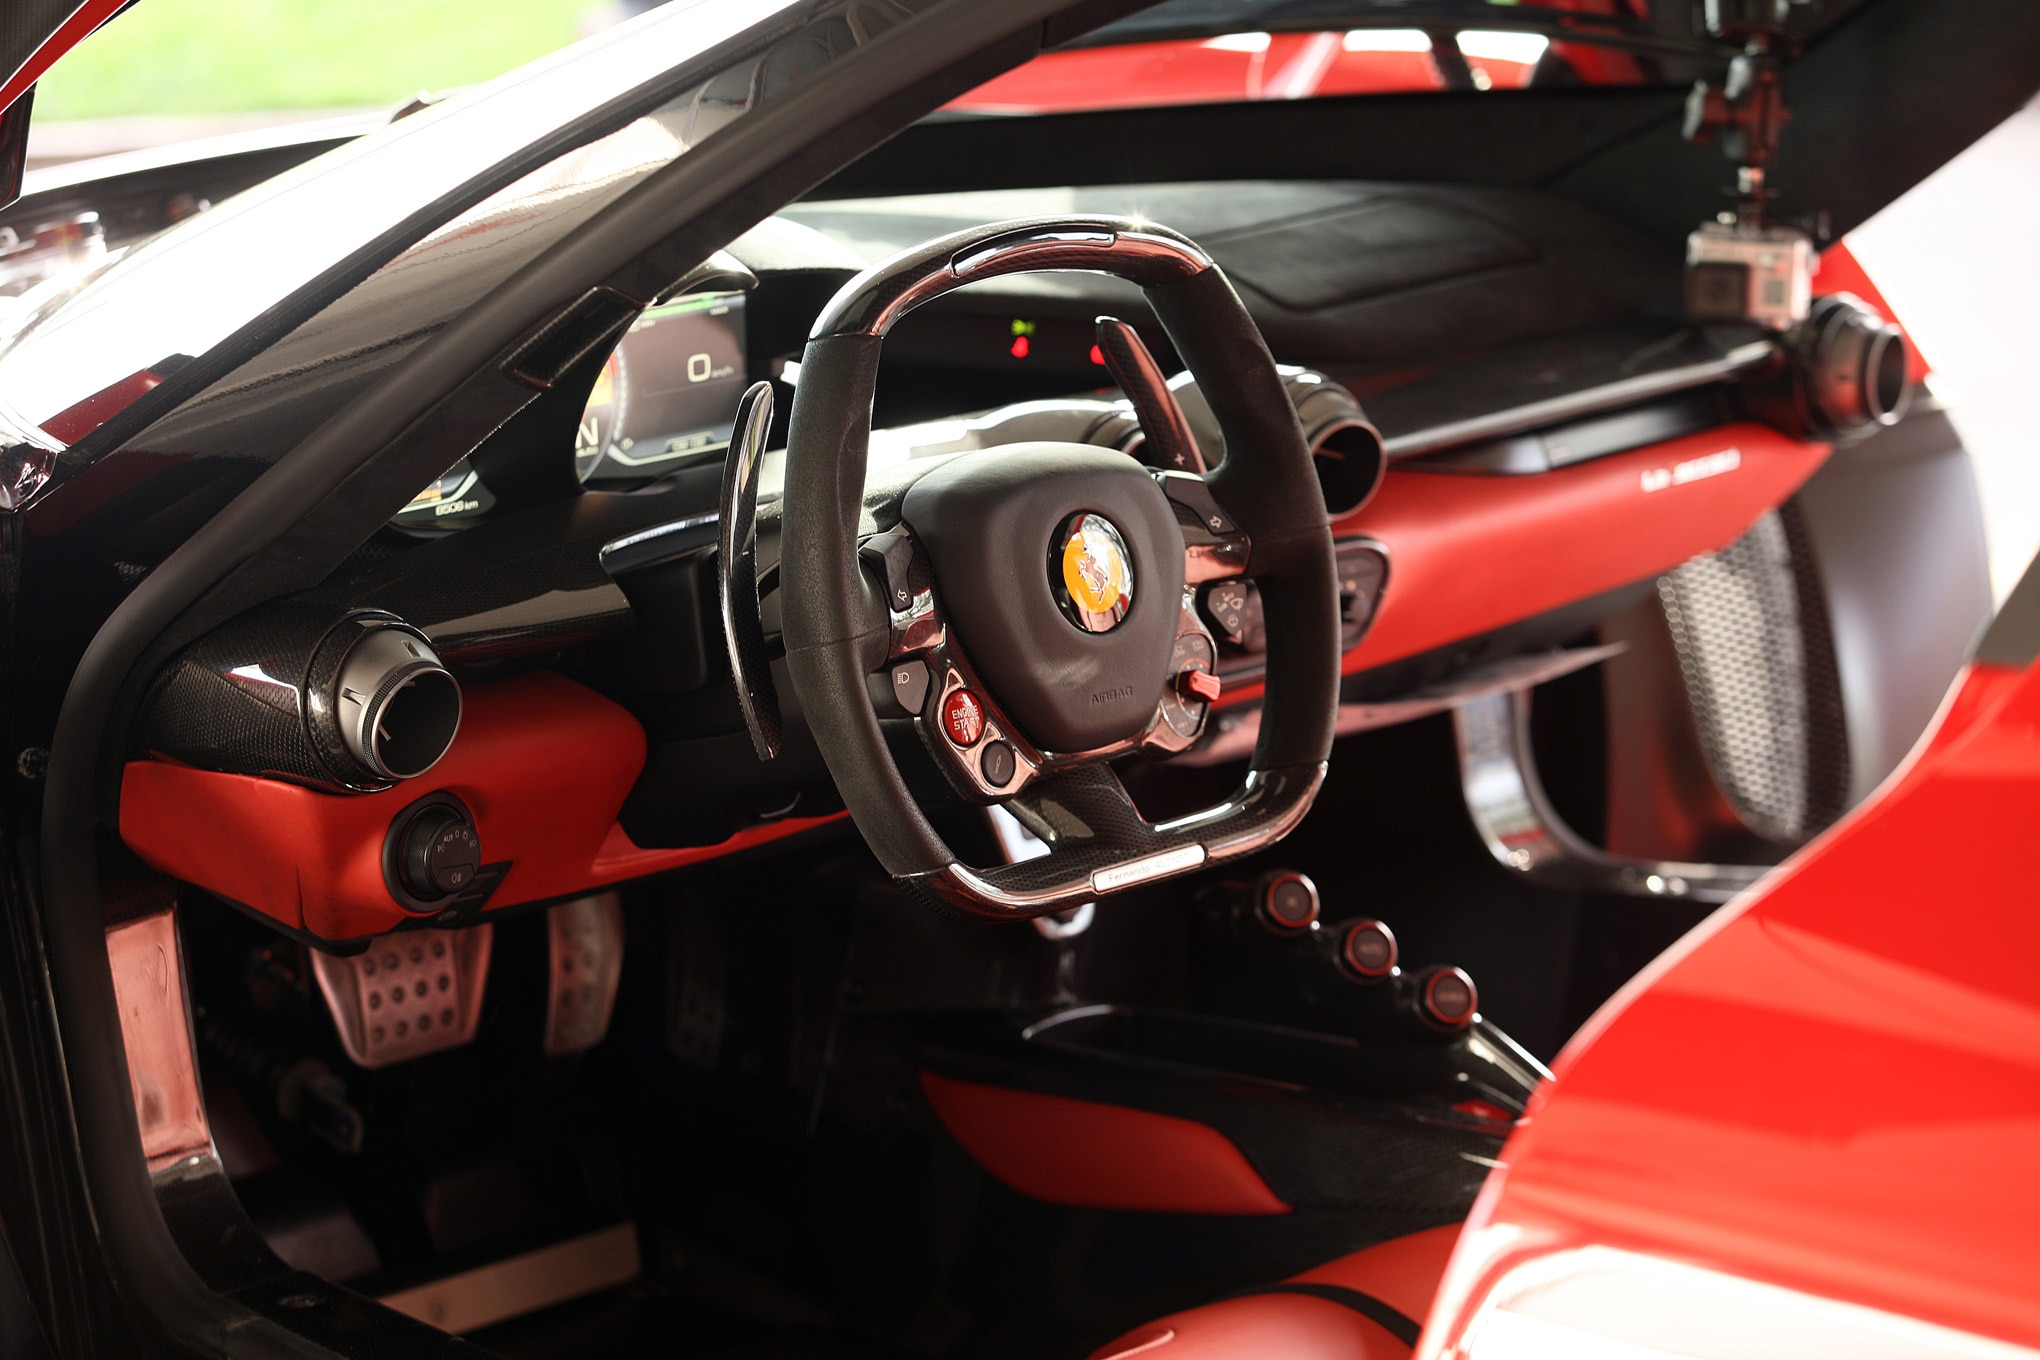 ferrari laferrari interior 02 - Ferrari 2014 Enzo Interior